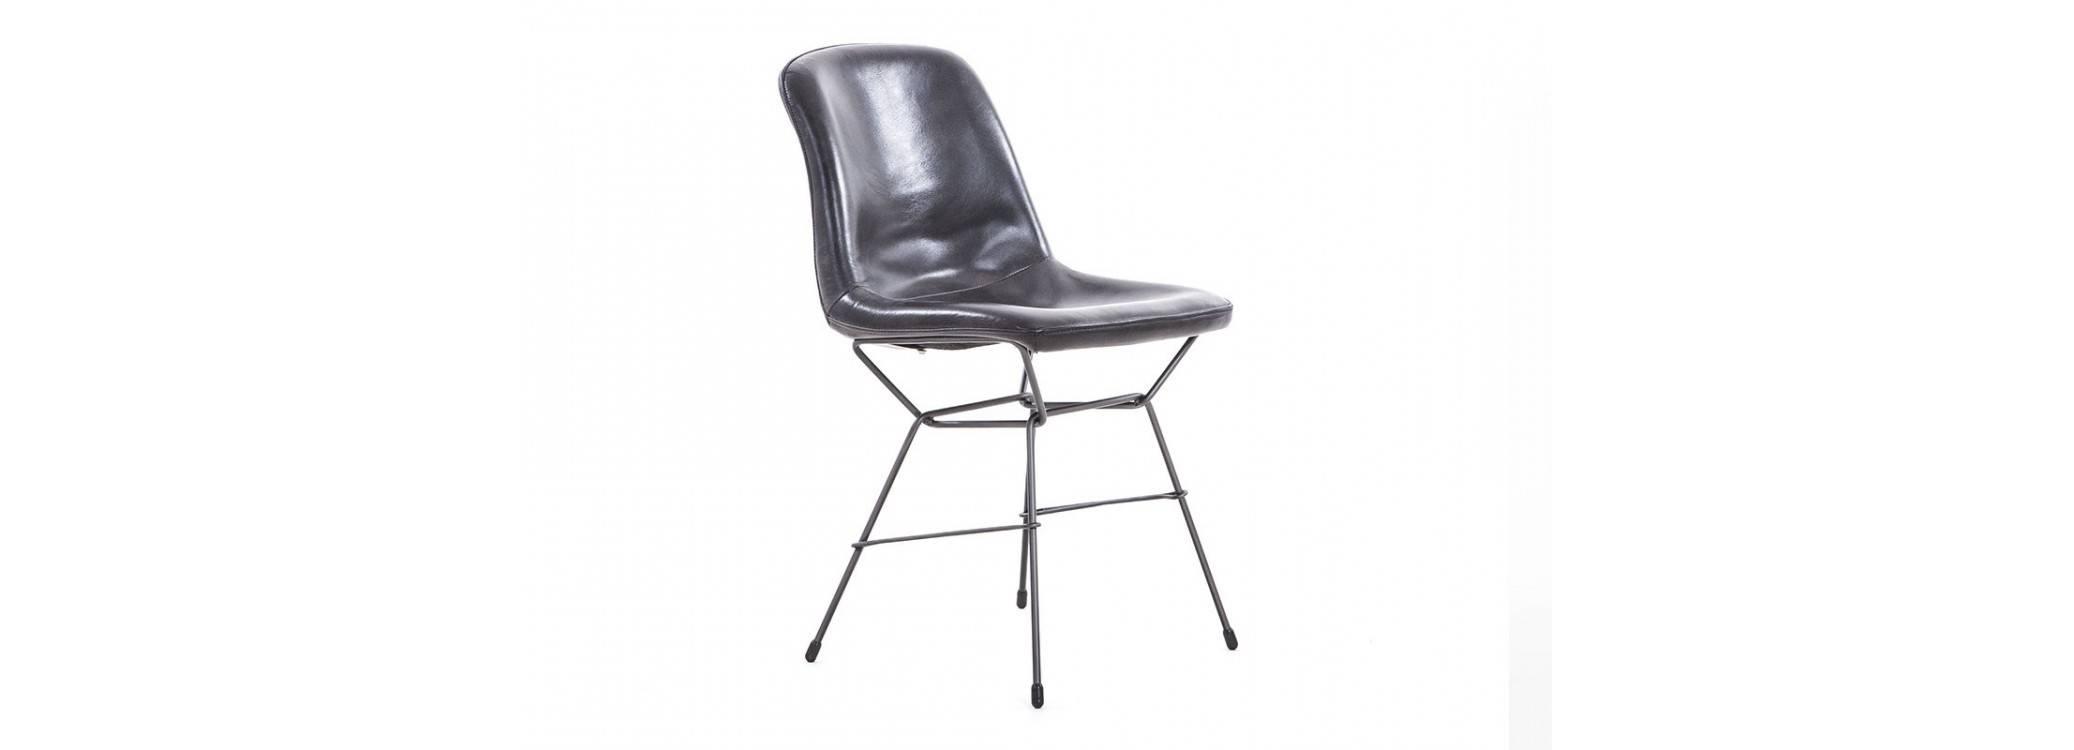 Chaise Rockford - Cuir gris et métal